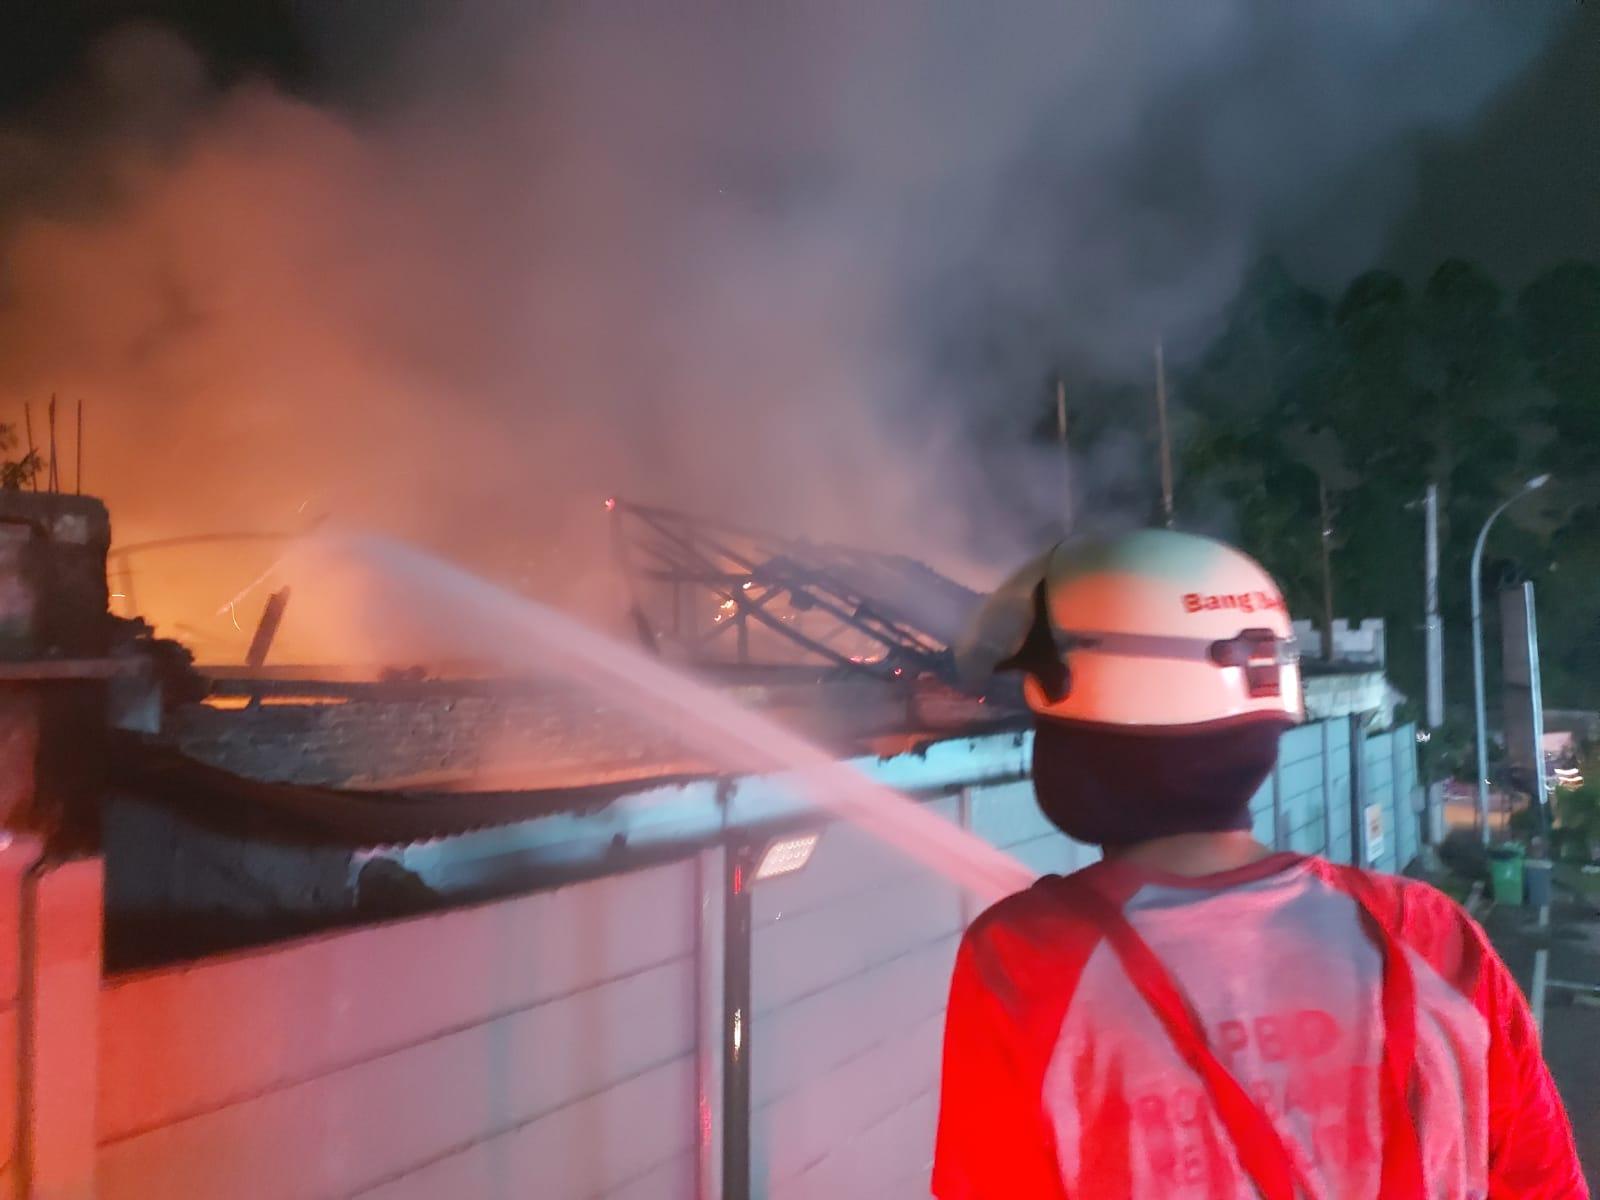 Petugas Badan Penanggulangan Bencana Daerah (BPBD) Kabupaten Tangerang saat berusaha memdamkan kobaran api di kantor Kepala Desa Bitung Jaya yang berlokasi di Kampung Bitung, Bitung Jaya, Kabupaten Tangerang, Rabu, 9 Juni 2021 malam.